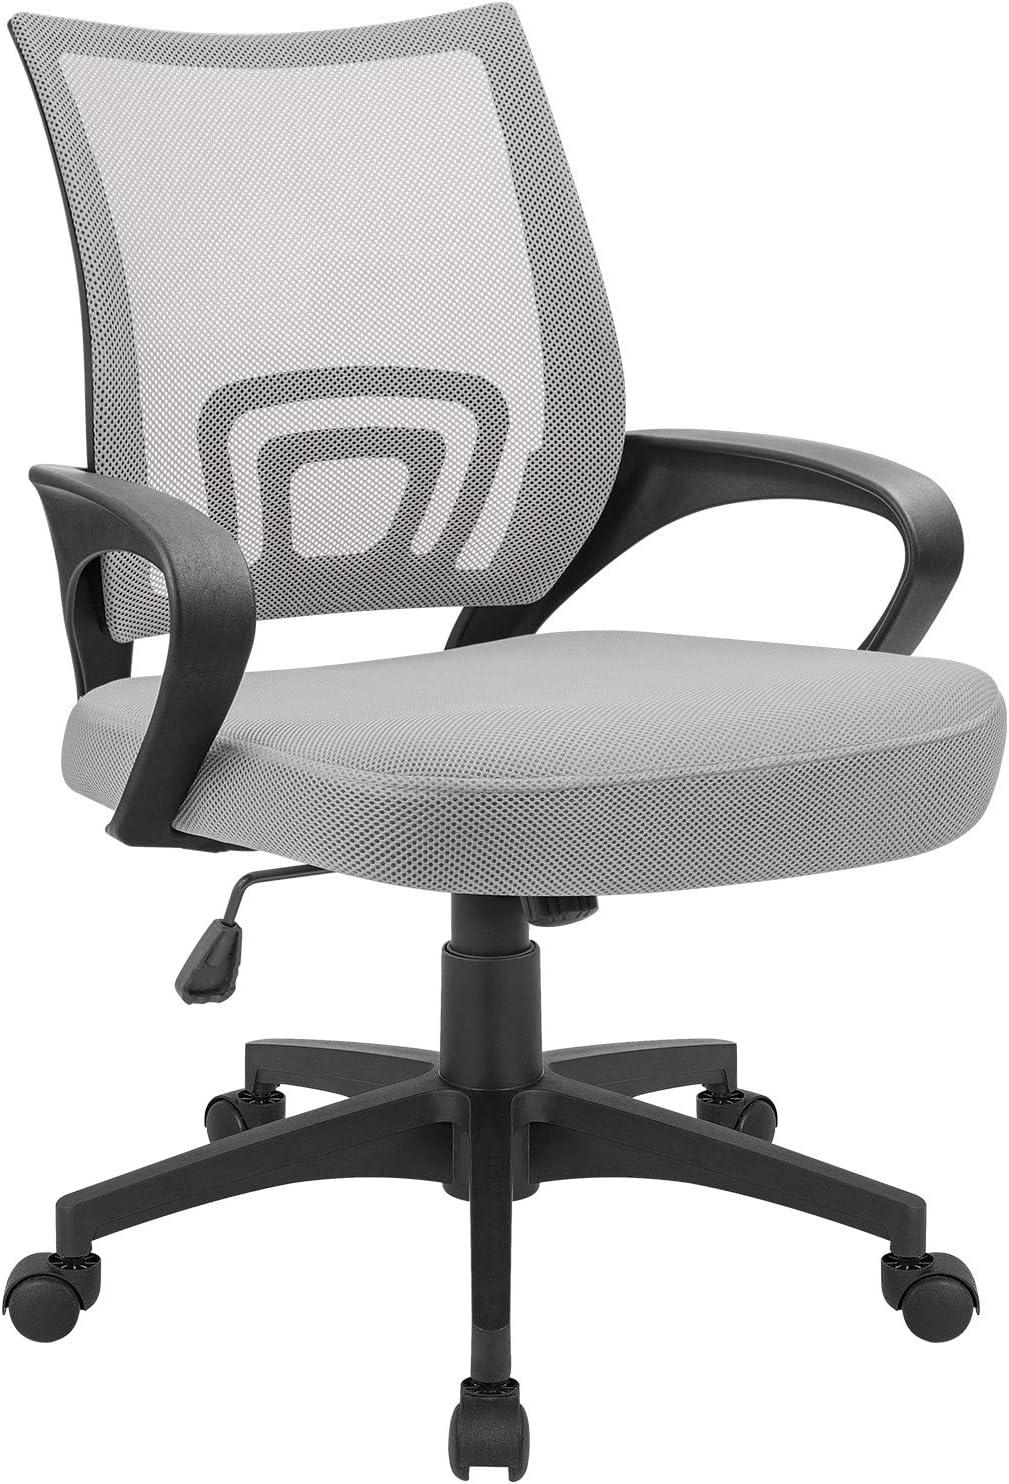 Devoko Office Chair Ergonomic Mid Back Swivel Mesh Chair Height Adjustable Lumbar Support Computer Desk Chair with Armrest (Grey)